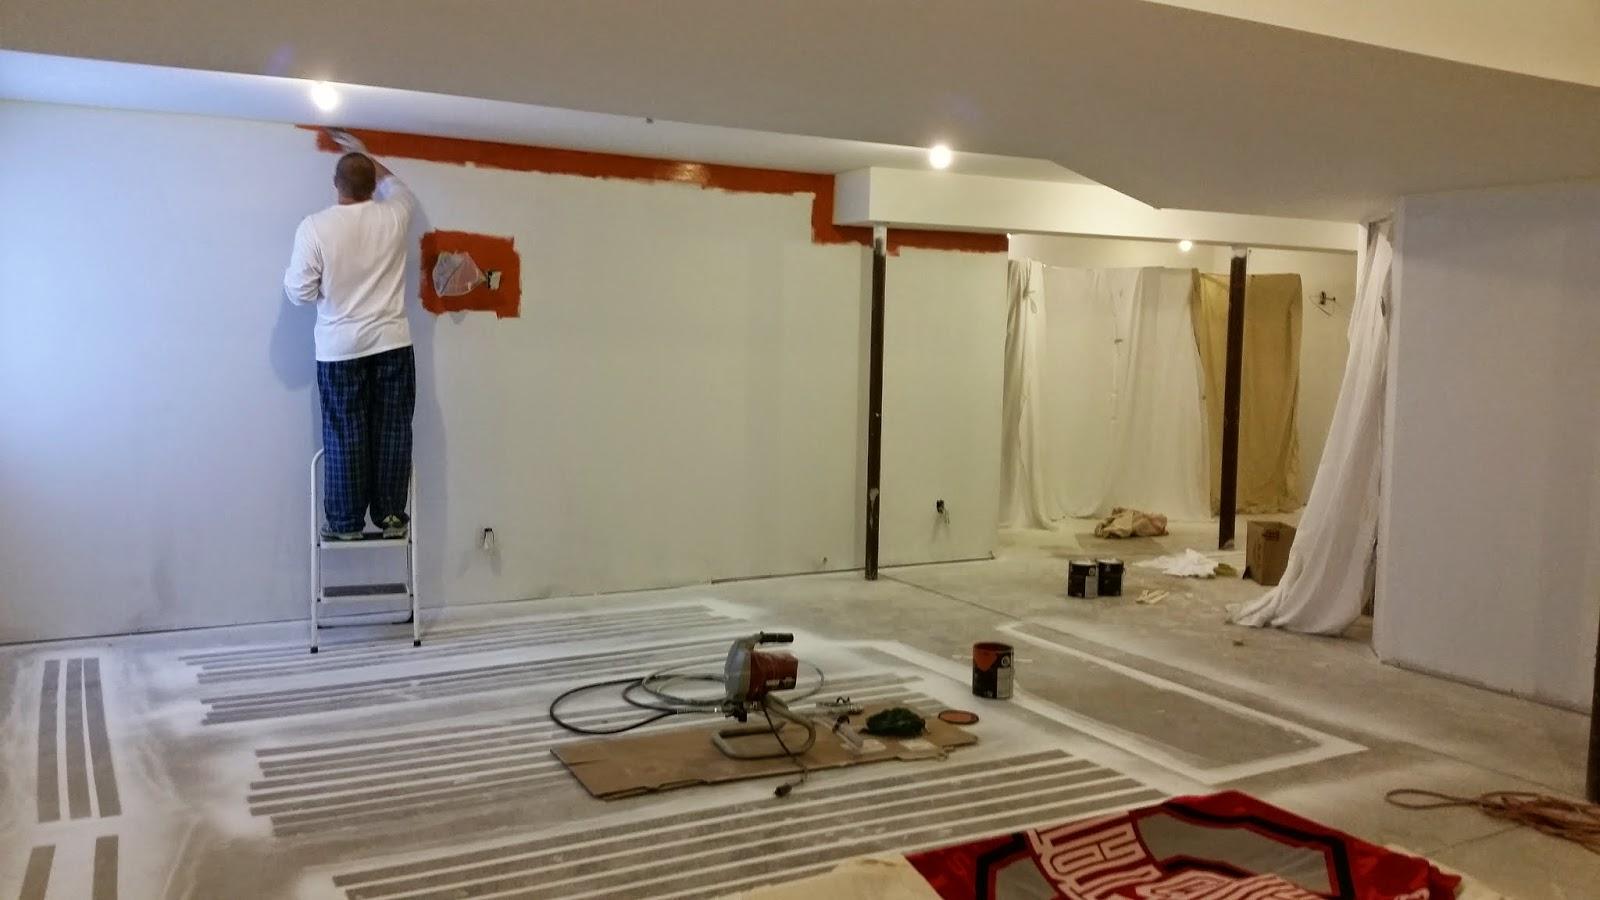 Primer For Concrete Floor Before Tiling Primer Concrete